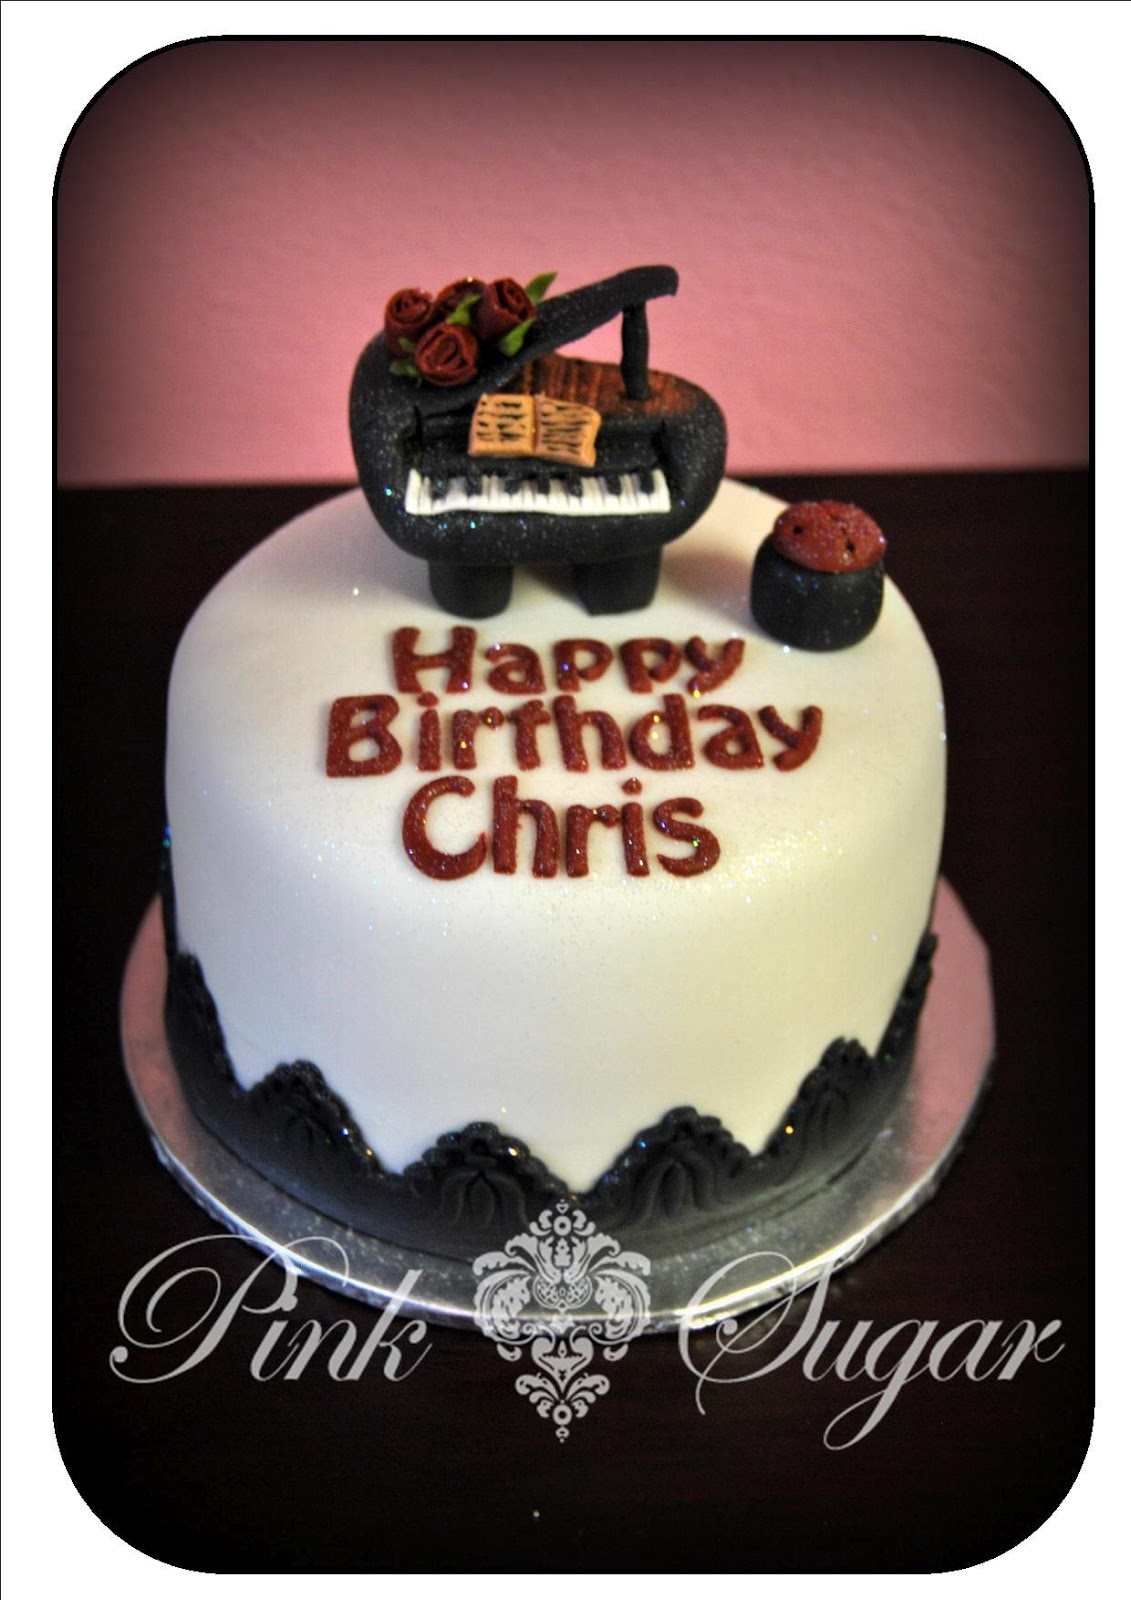 Sensational Craftylillybargainbin Blogspot Com Happy Birthday Chris Funny Birthday Cards Online Eattedamsfinfo